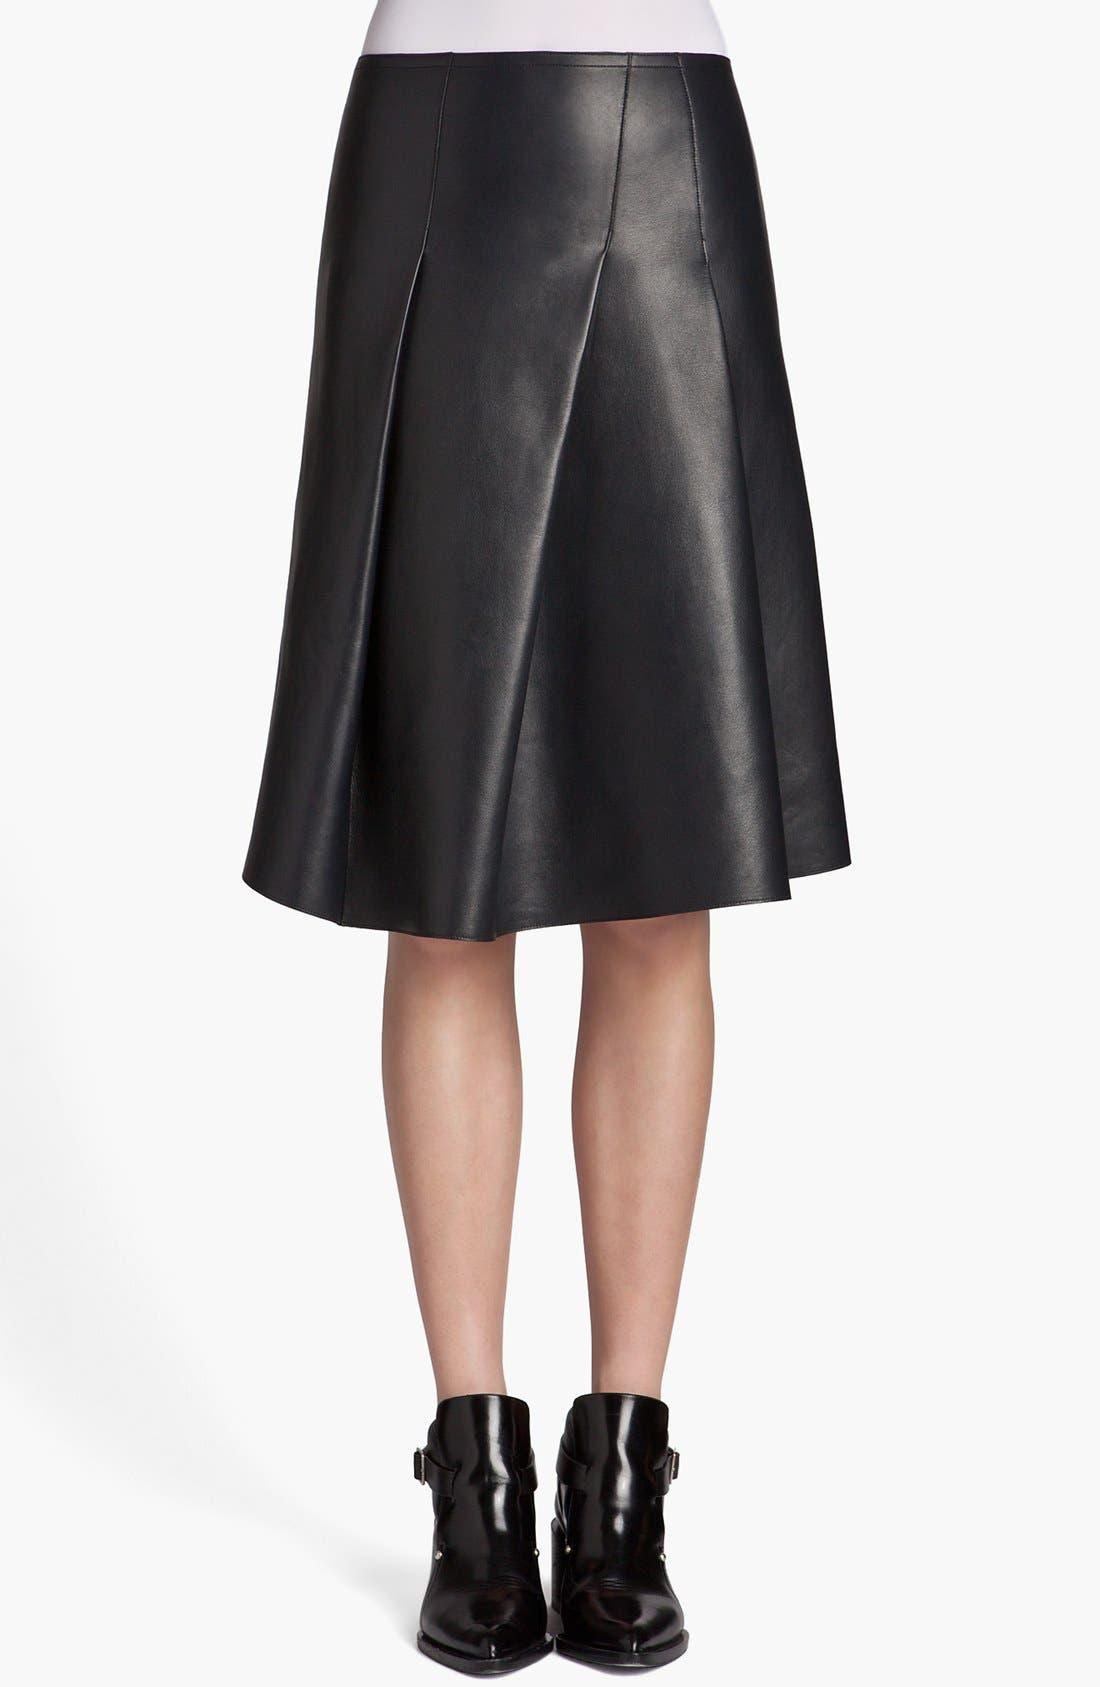 Main Image - Jil Sander 'Pom Pom' Pleated Leather Skirt